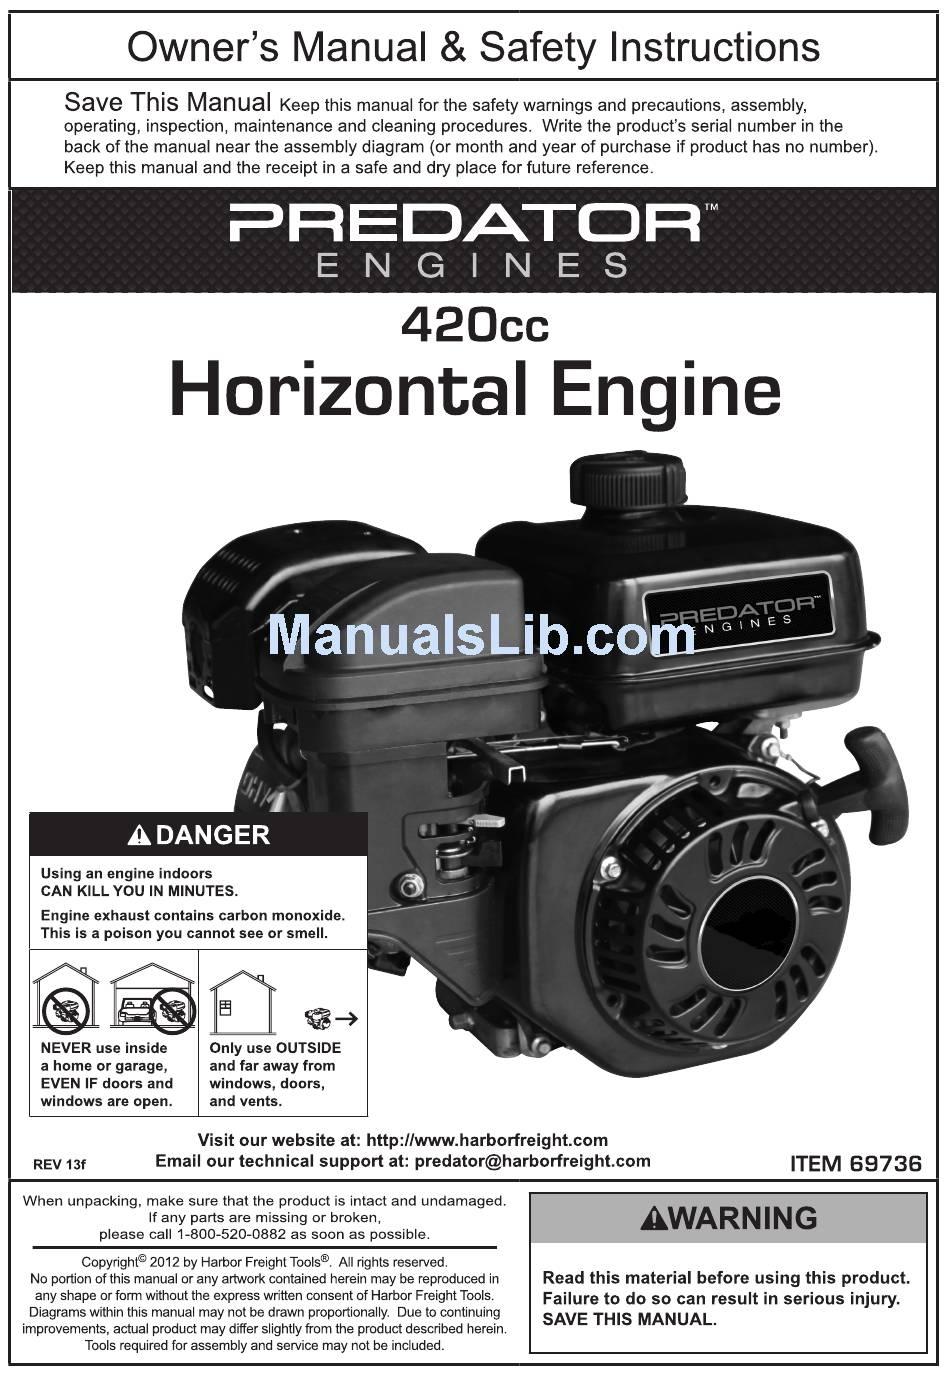 PREDATOR ENGINES 420CC OWNER'S MANUAL & SAFETY INSTRUCTIONS Pdf Download    ManualsLibManualsLib